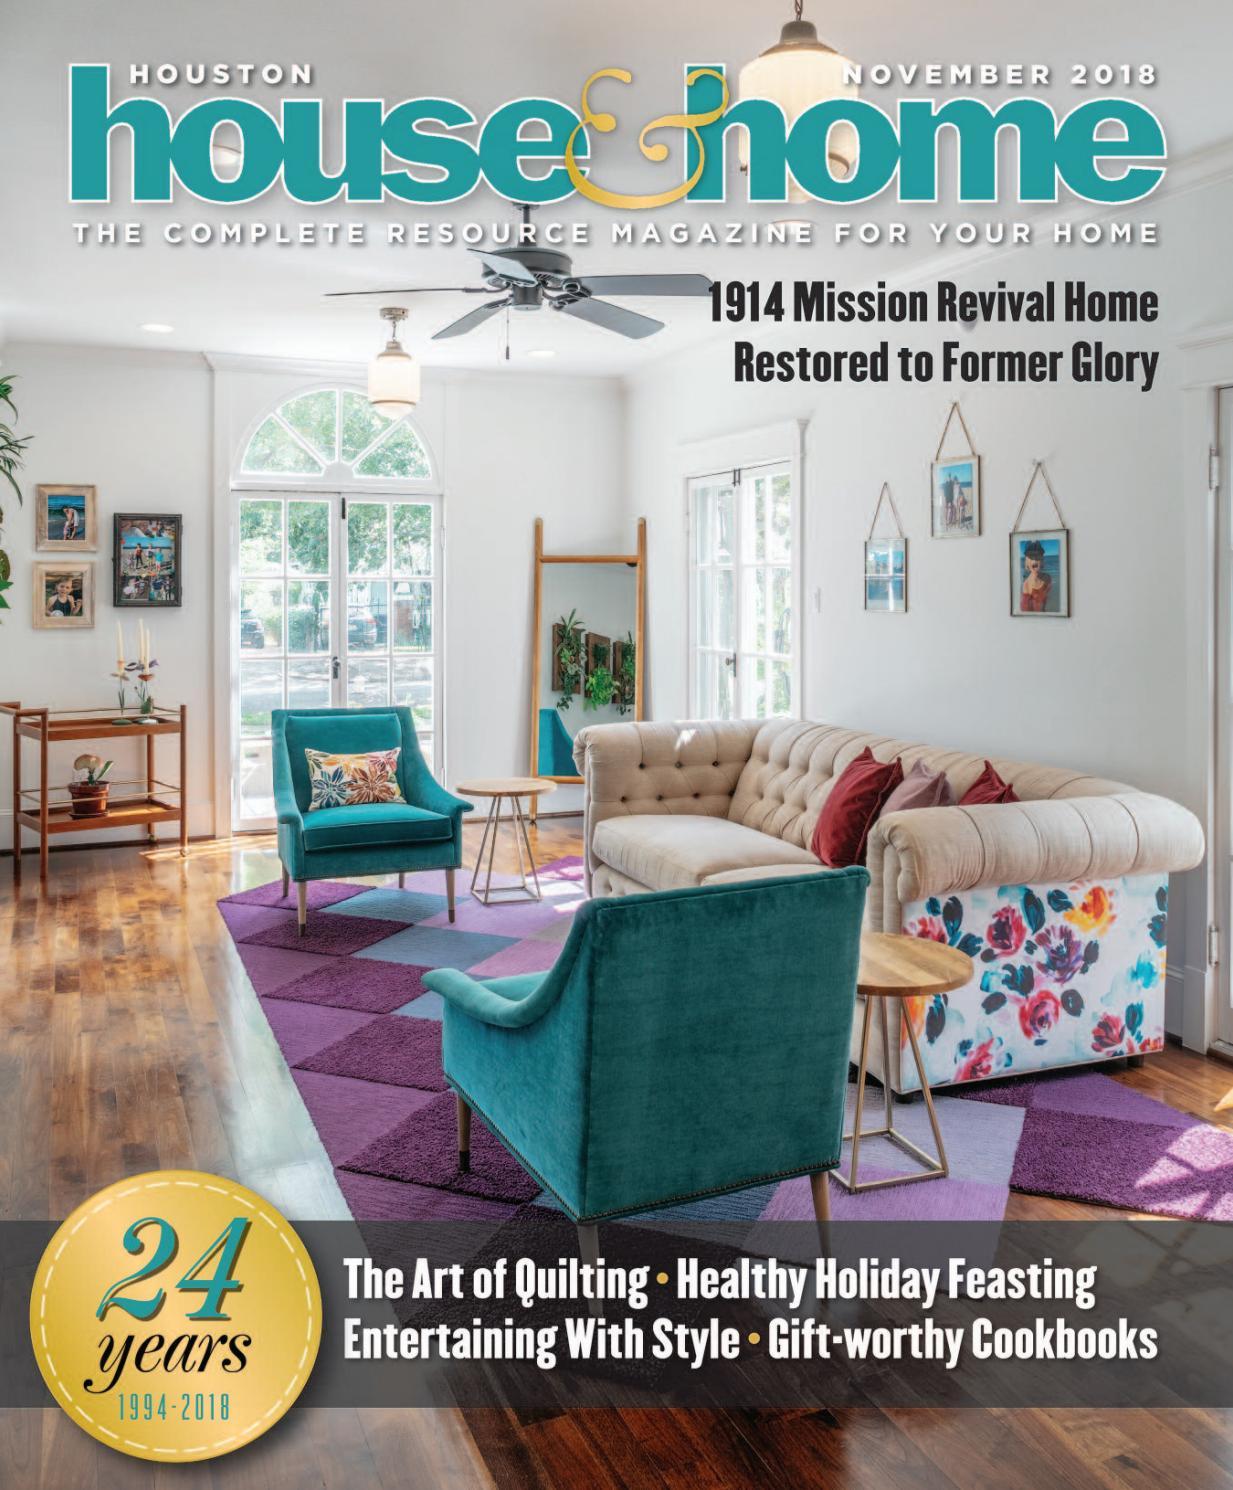 Houston House & Home Magazine November 2018 Issue By